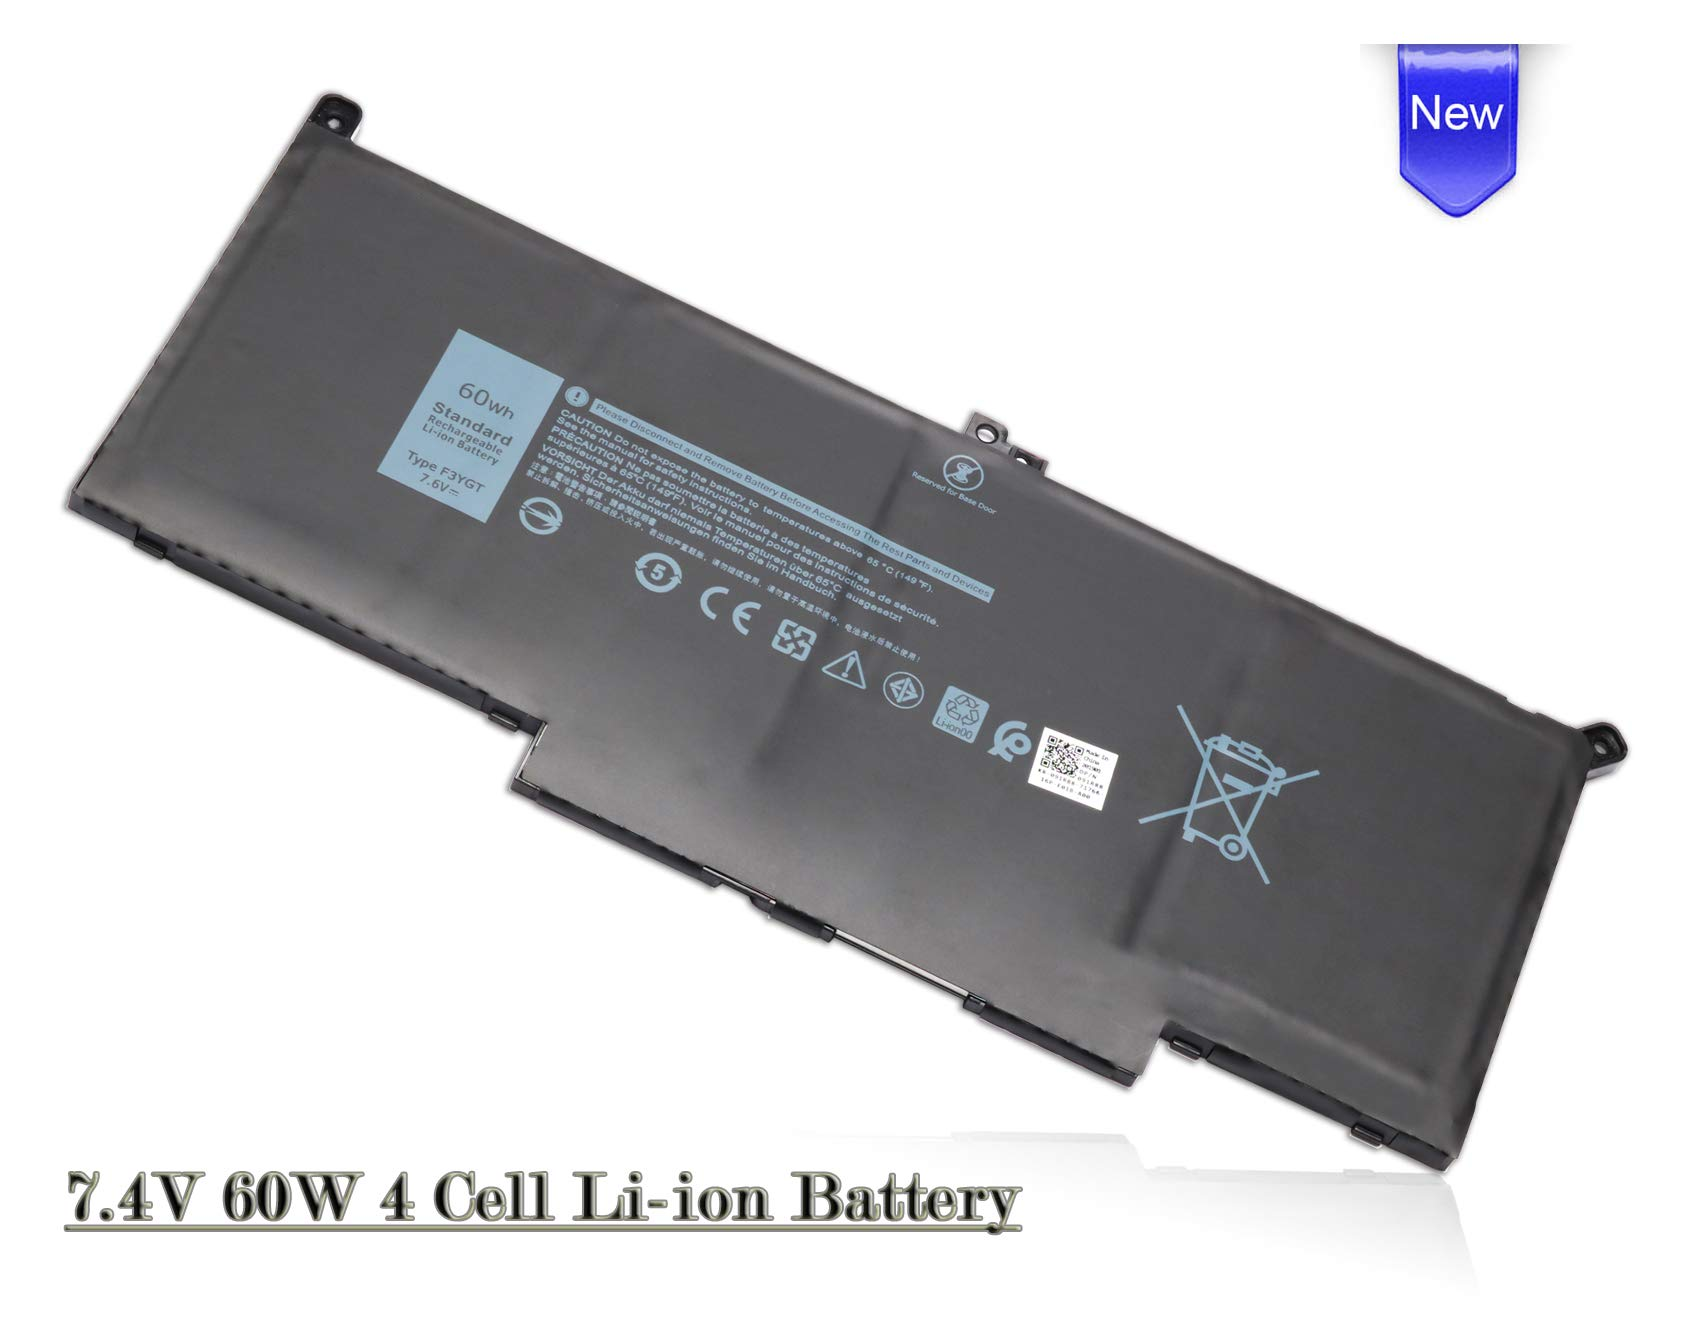 Bateria F3YGT para Dell Latitude 12 7000 7280 7290 13 7000 7380 7390 14 7000 7480 7490 Series DM3WC 0DM3WC 2X39G- 60Wh 7